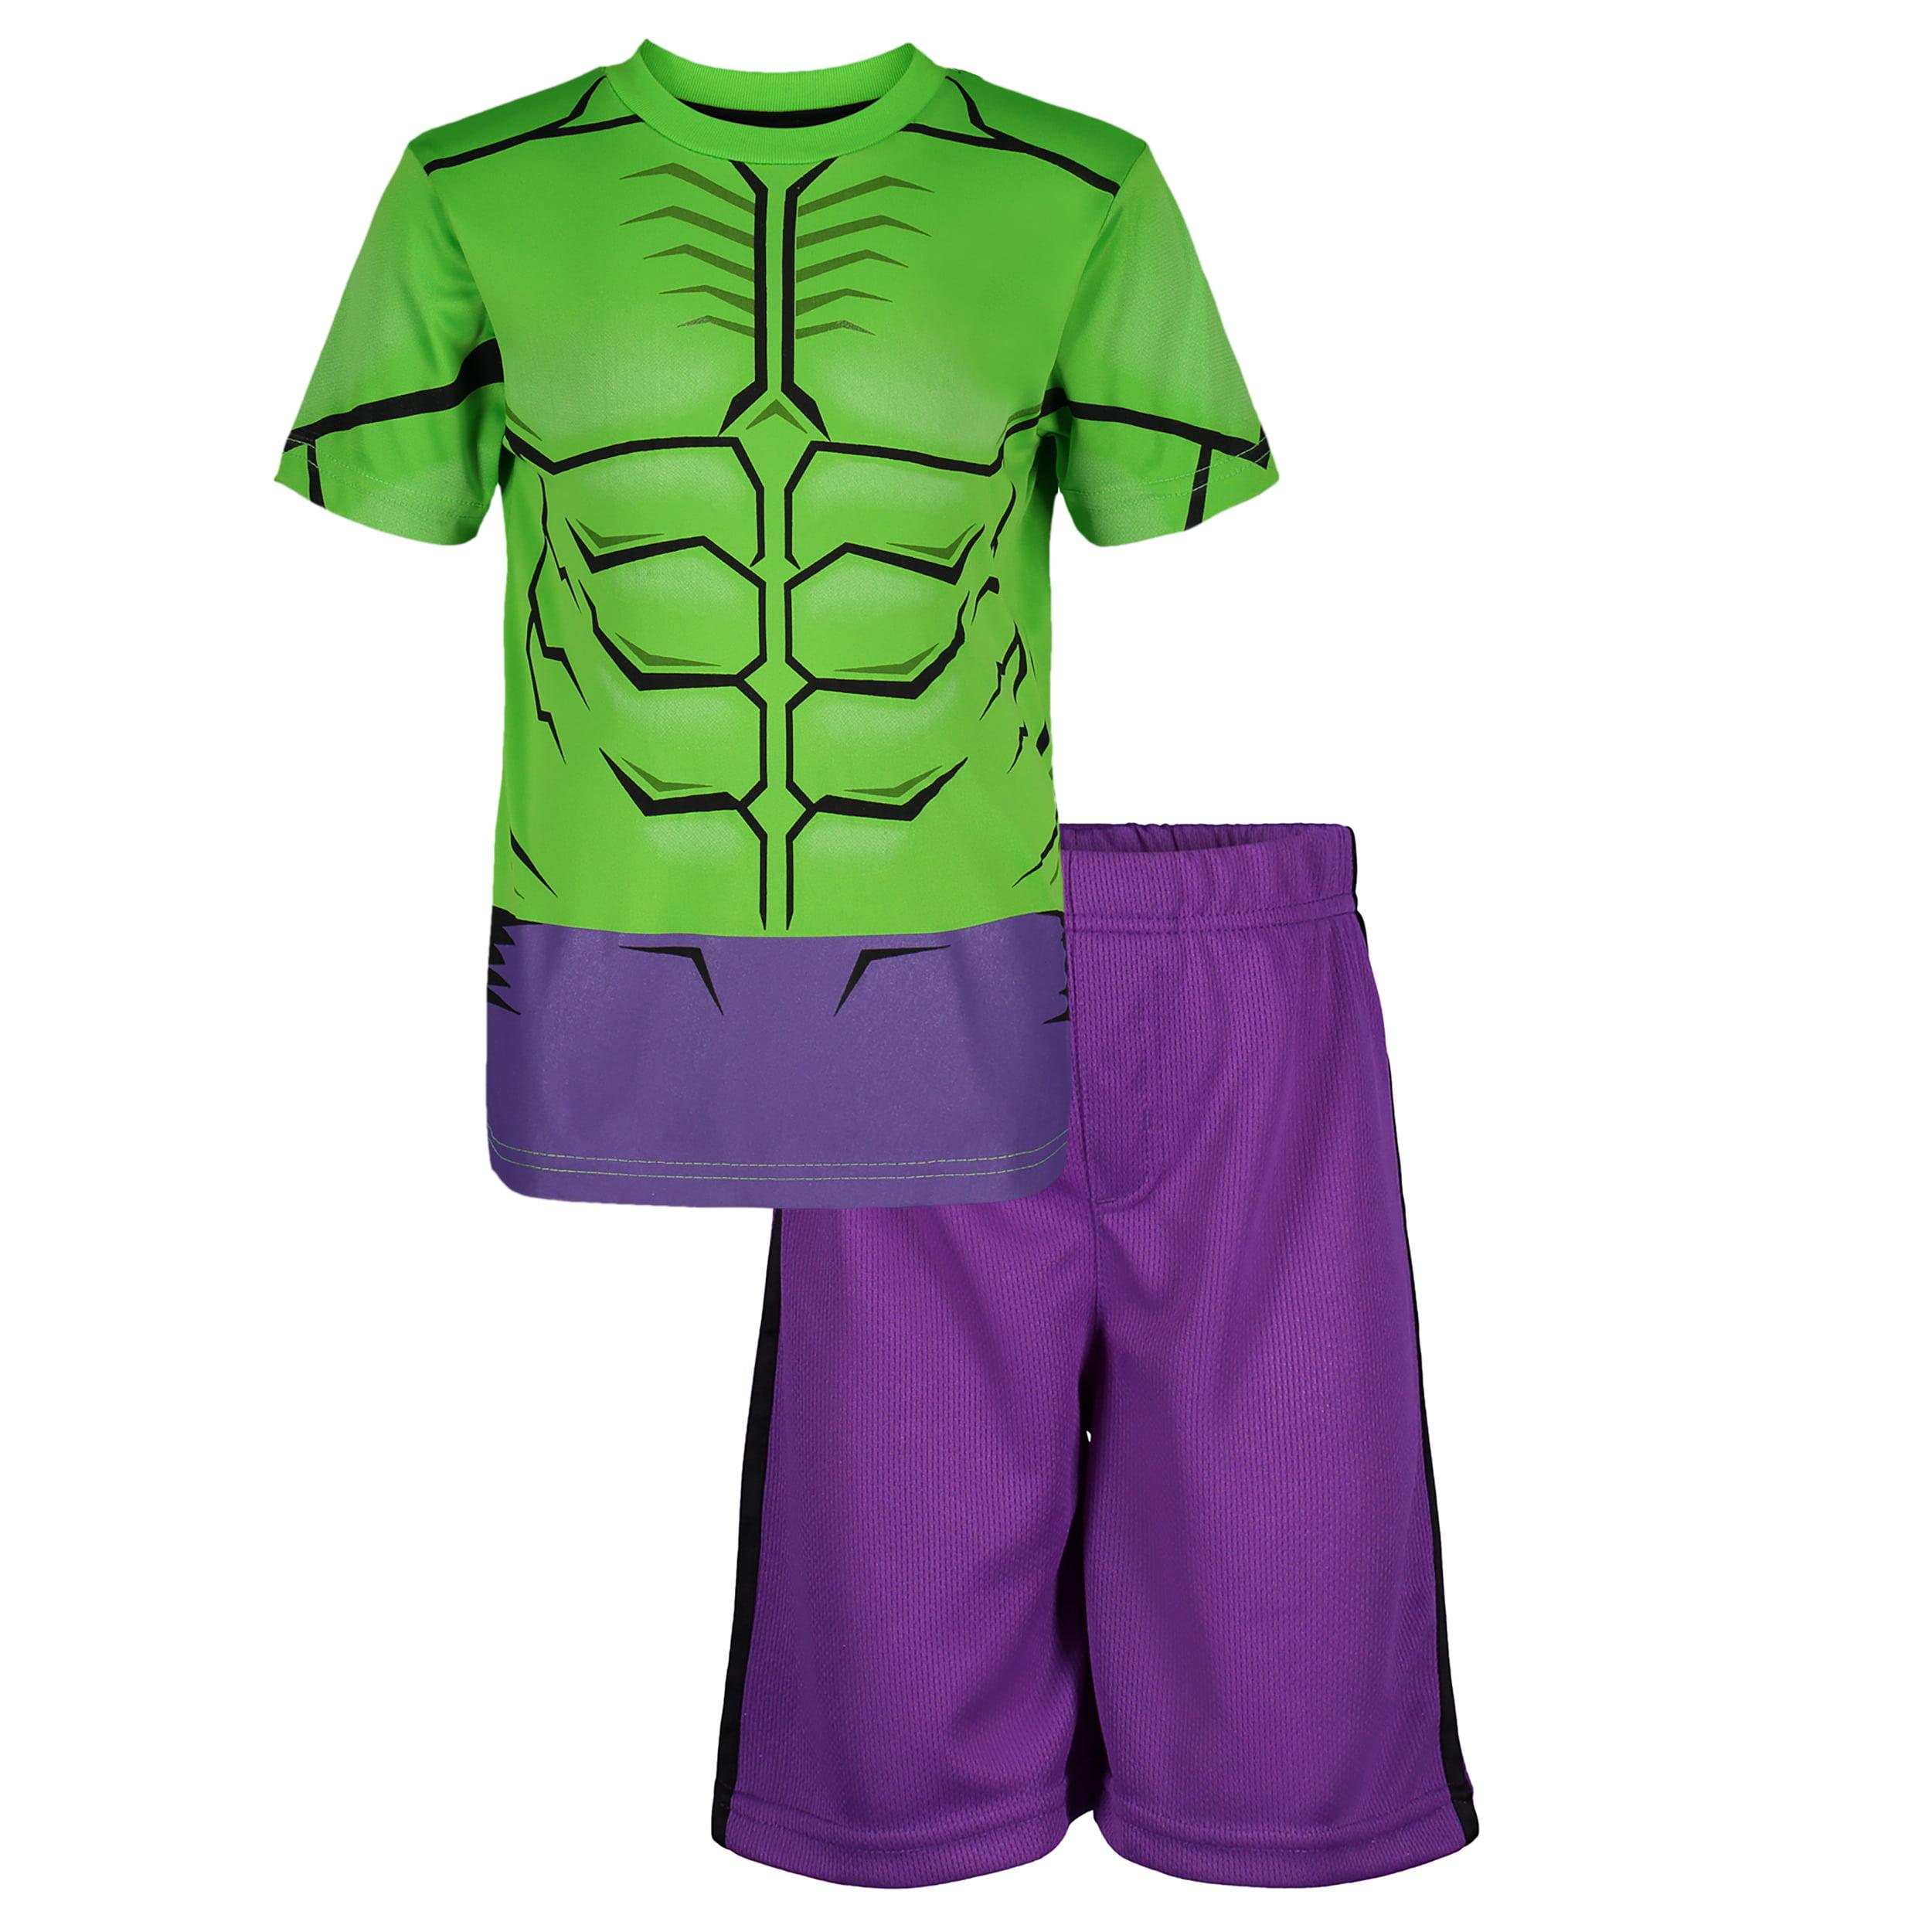 66a98056ab6 Marvel Avengers Hulk Little Boys' Athletic T-Shirt & Mesh Shorts Set,  Green/ Purple (7)